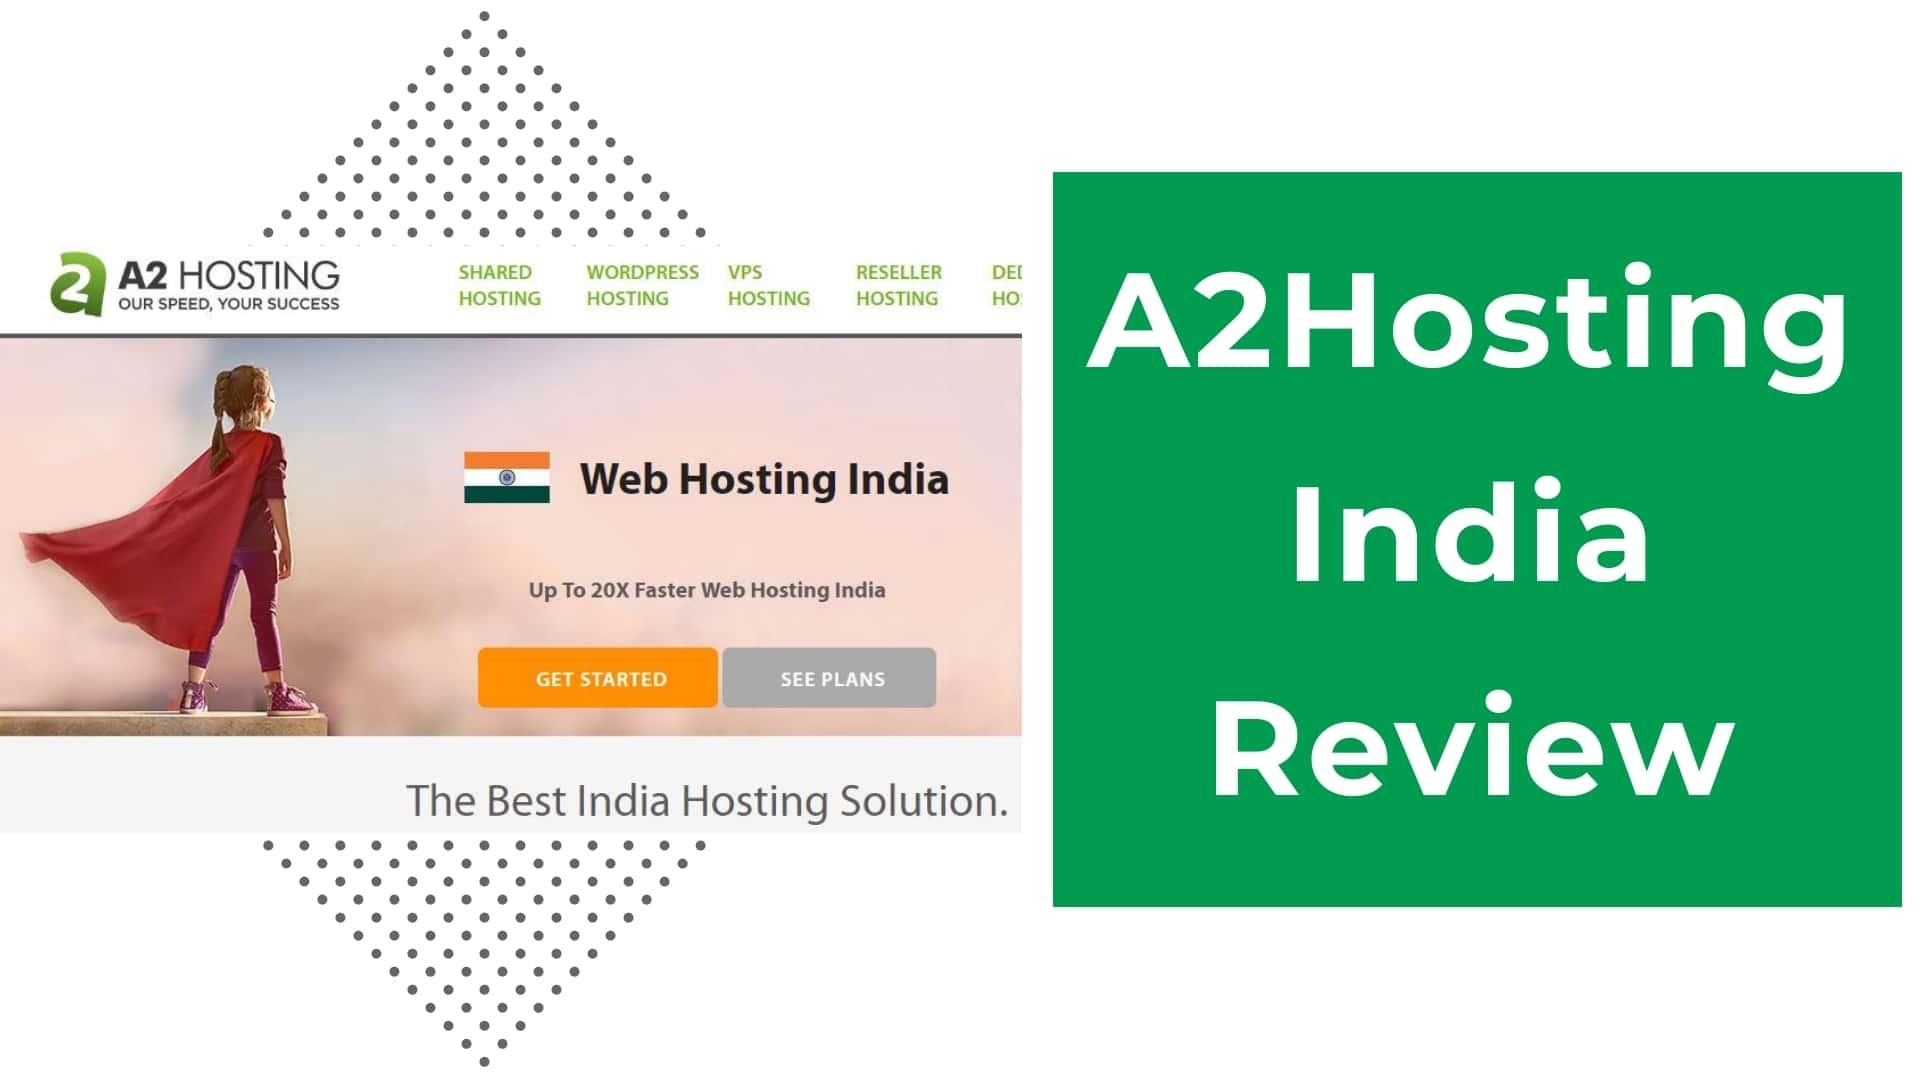 A2hosting India review